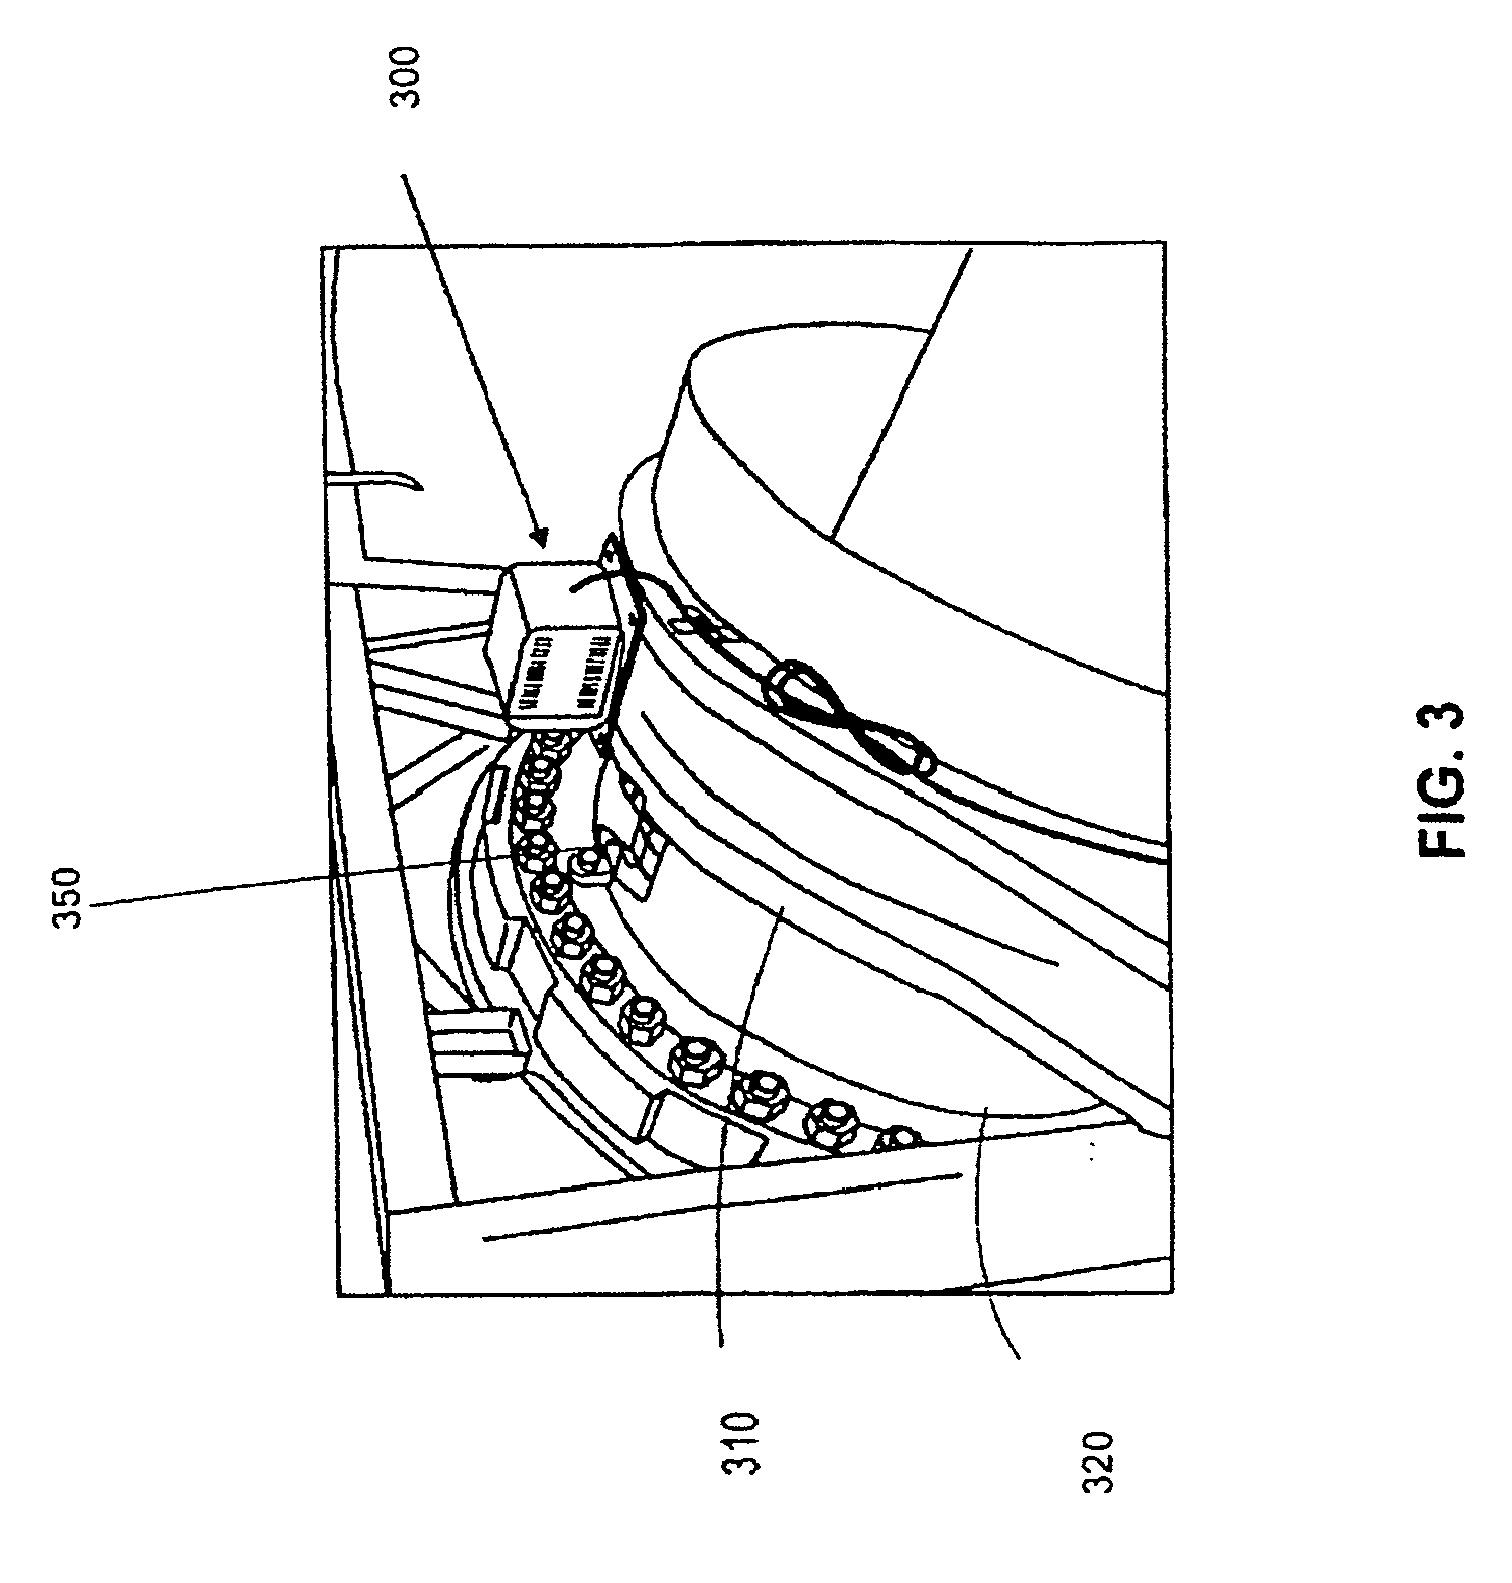 patent ep1674724a2